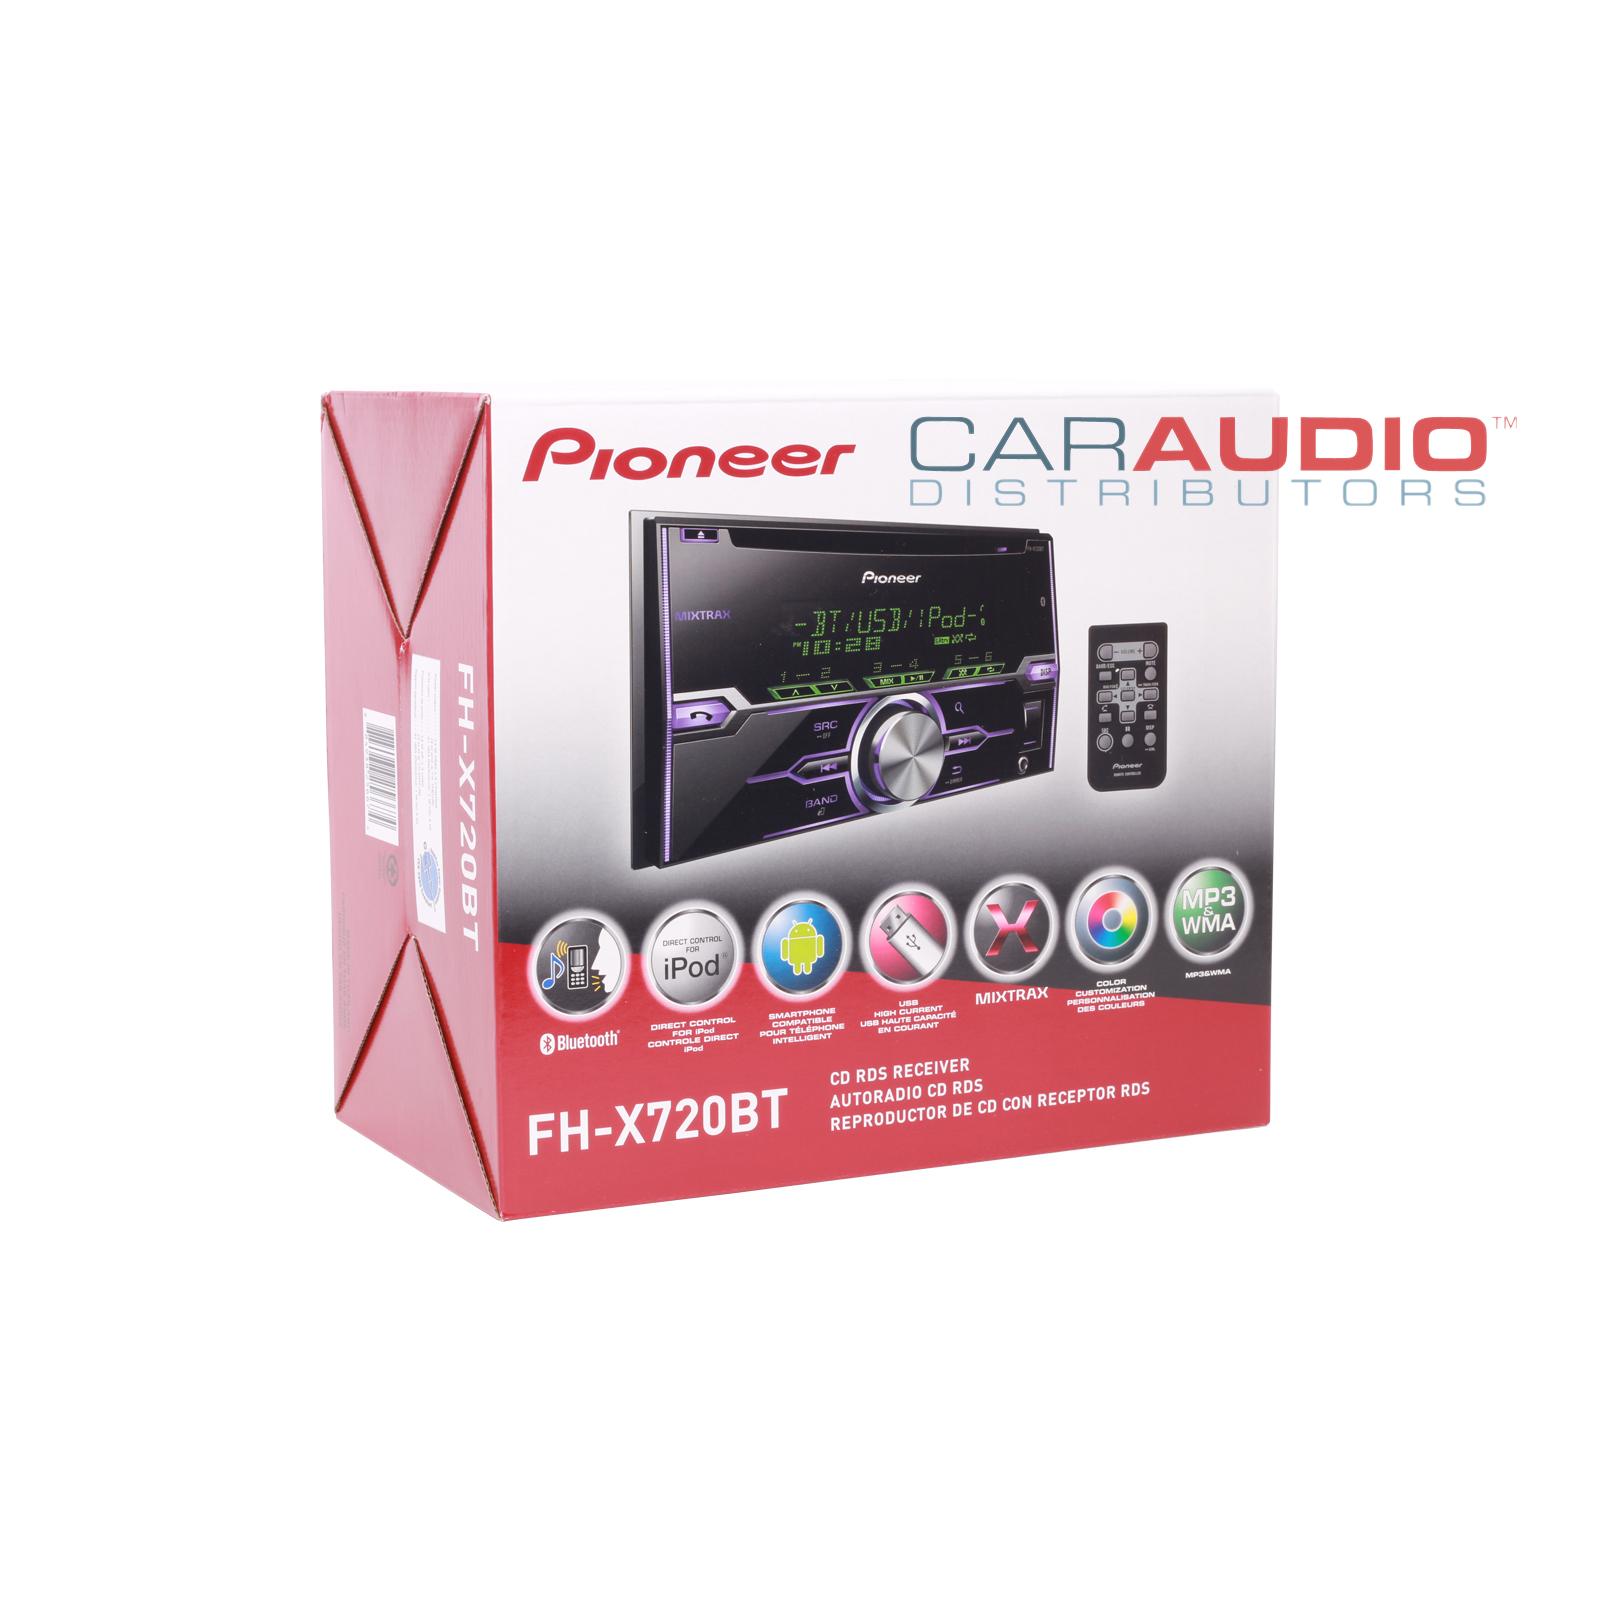 pioneer fh x720bt be nungsanleitung deutsch t1 line wiring diagram new in dash car stereo double din cd mp3